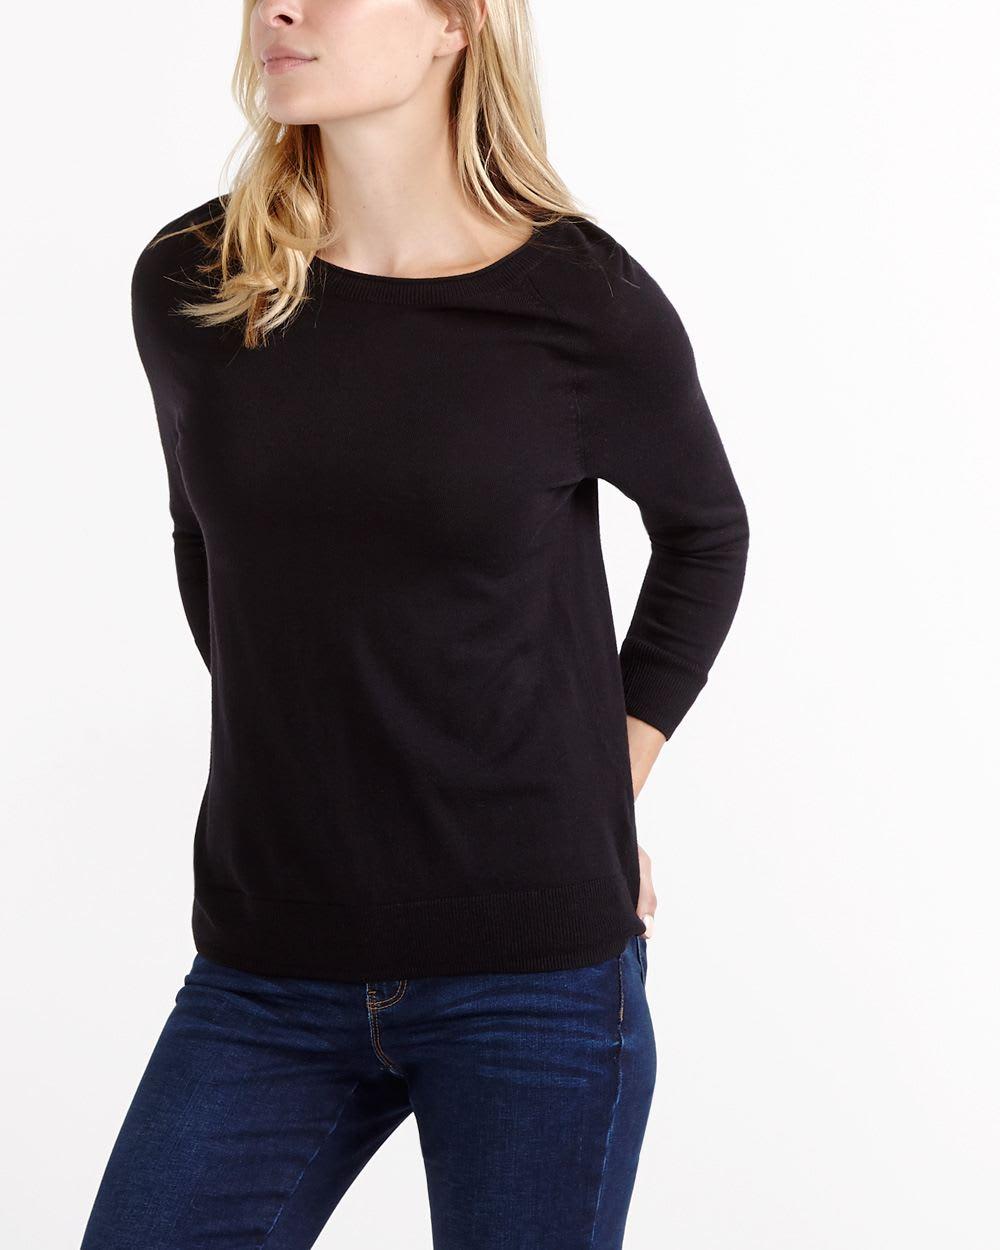 R Essentials ¾ Sleeve Sweater